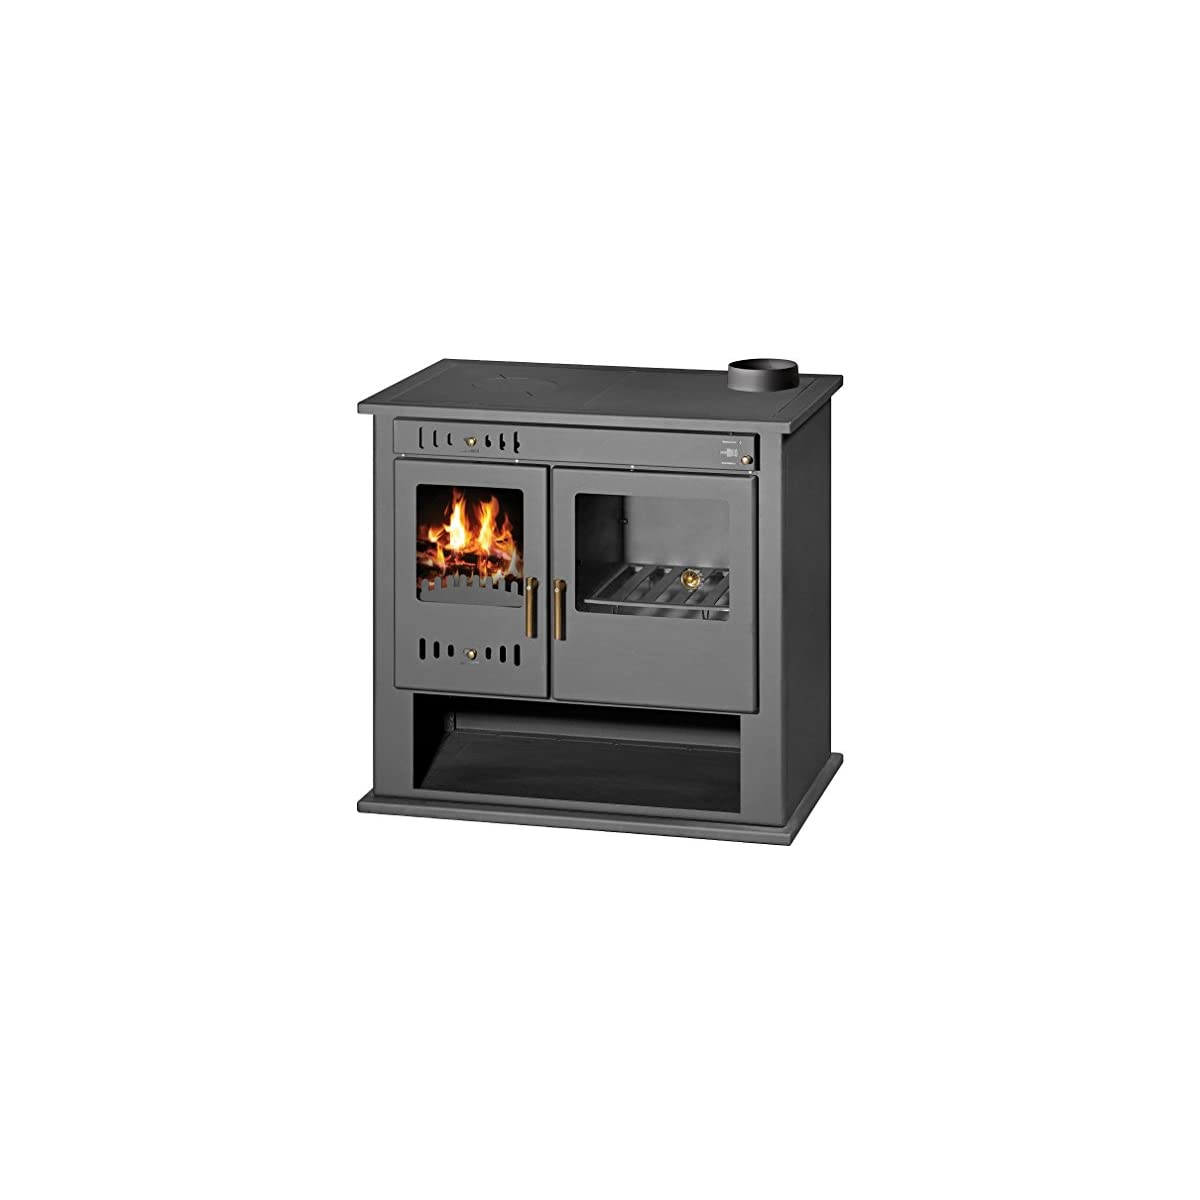 519orpQXw3L. SS1200  - Estufa de leña estufa chimenea para sistema de calefacción central horno cocina combustible sólido 9 KW VICTORIA